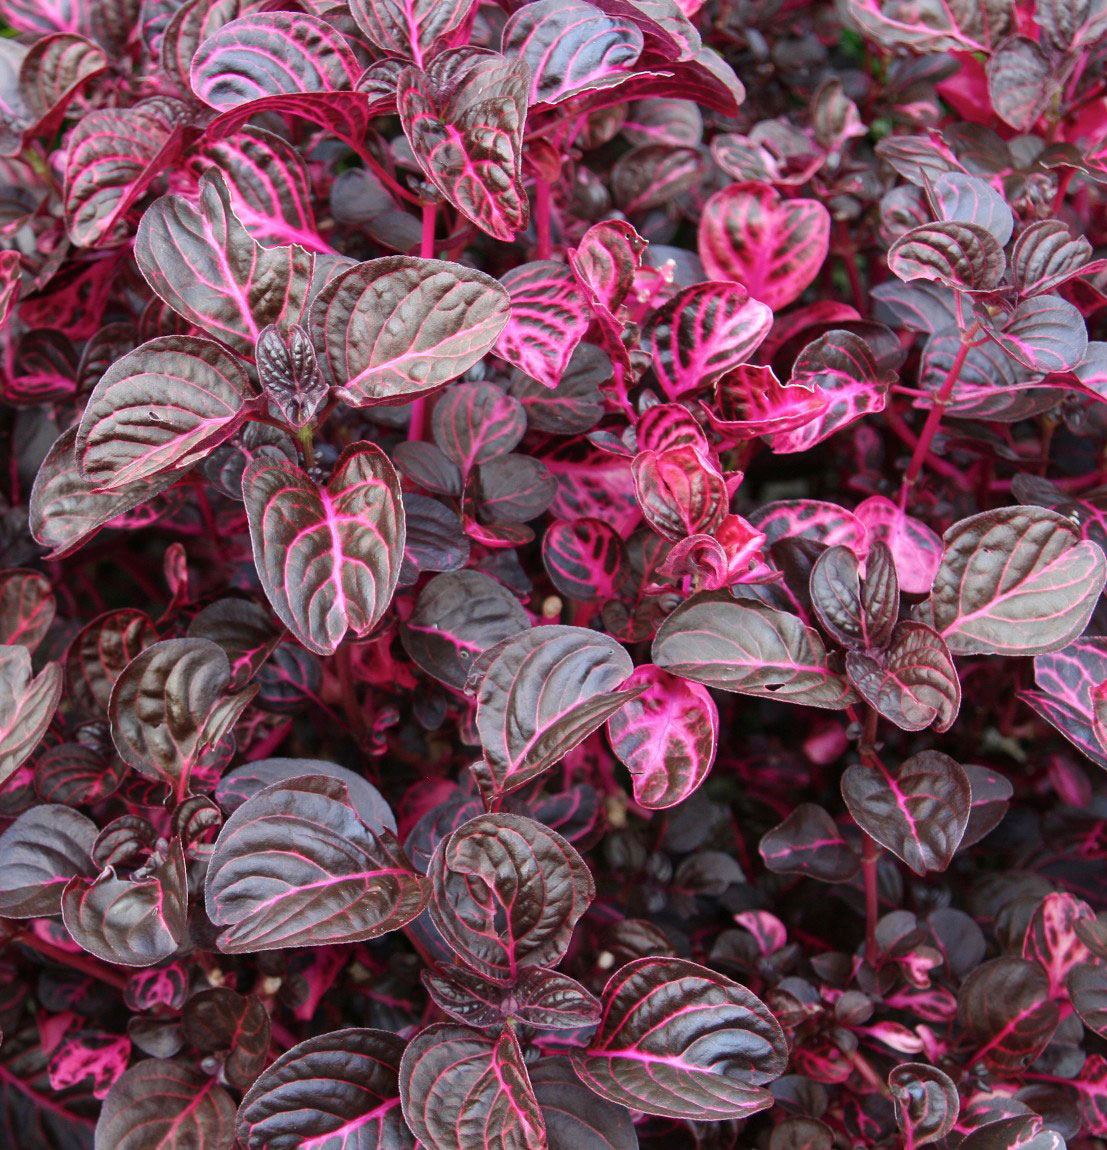 plantslive-Iresine herbstii aureoreticulata - Plant